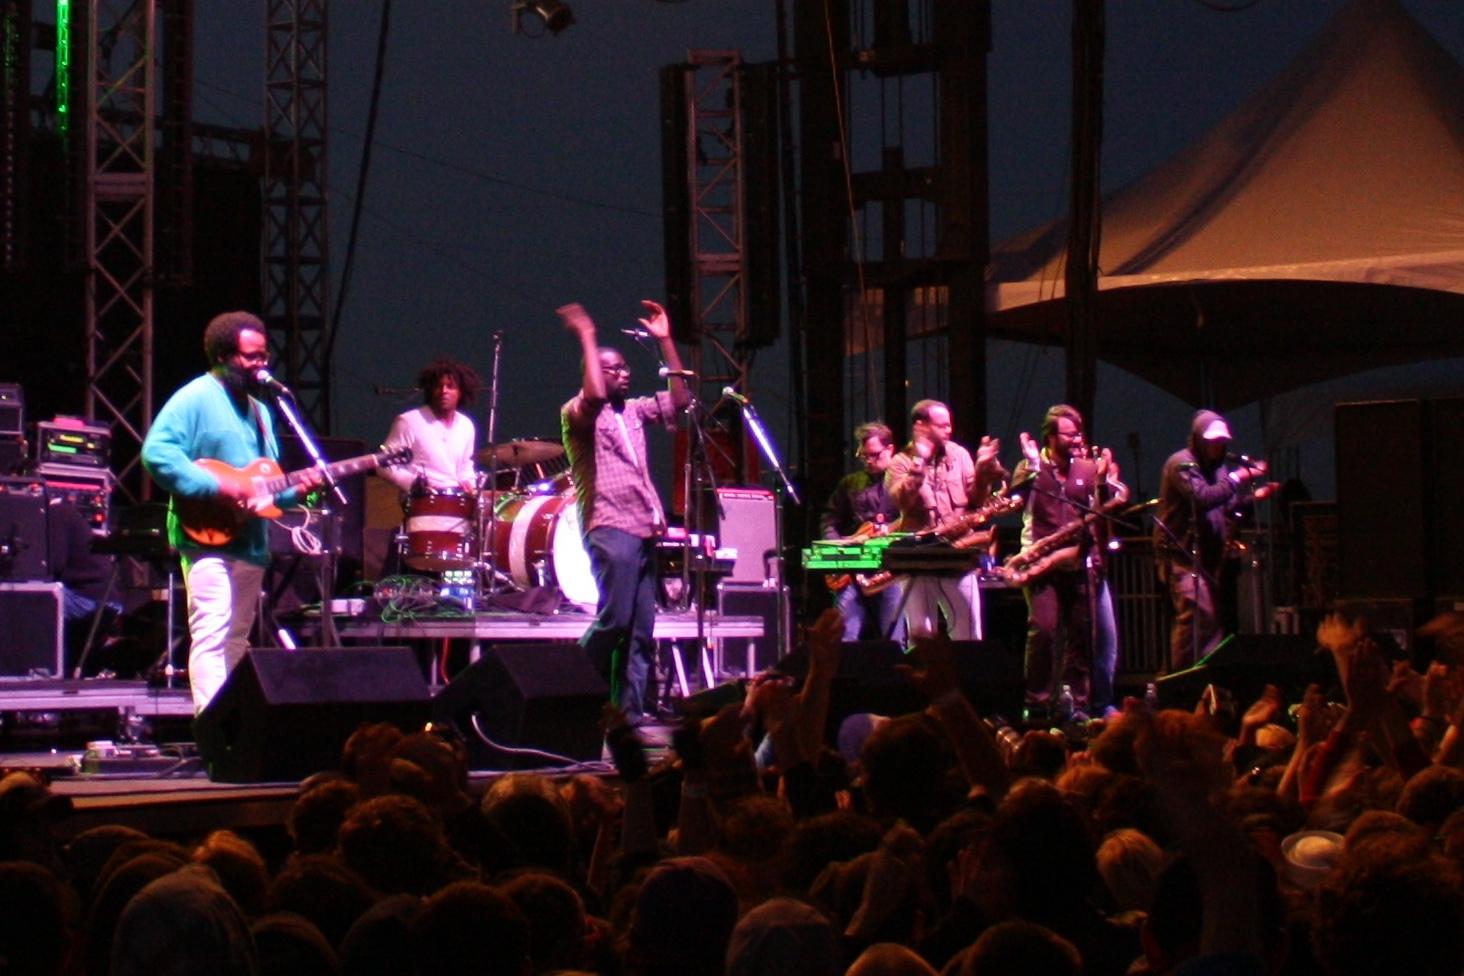 Antibalas_TV_on_the_Radio_2008_Treasure_Island_Music_Festival_cropped.jpg